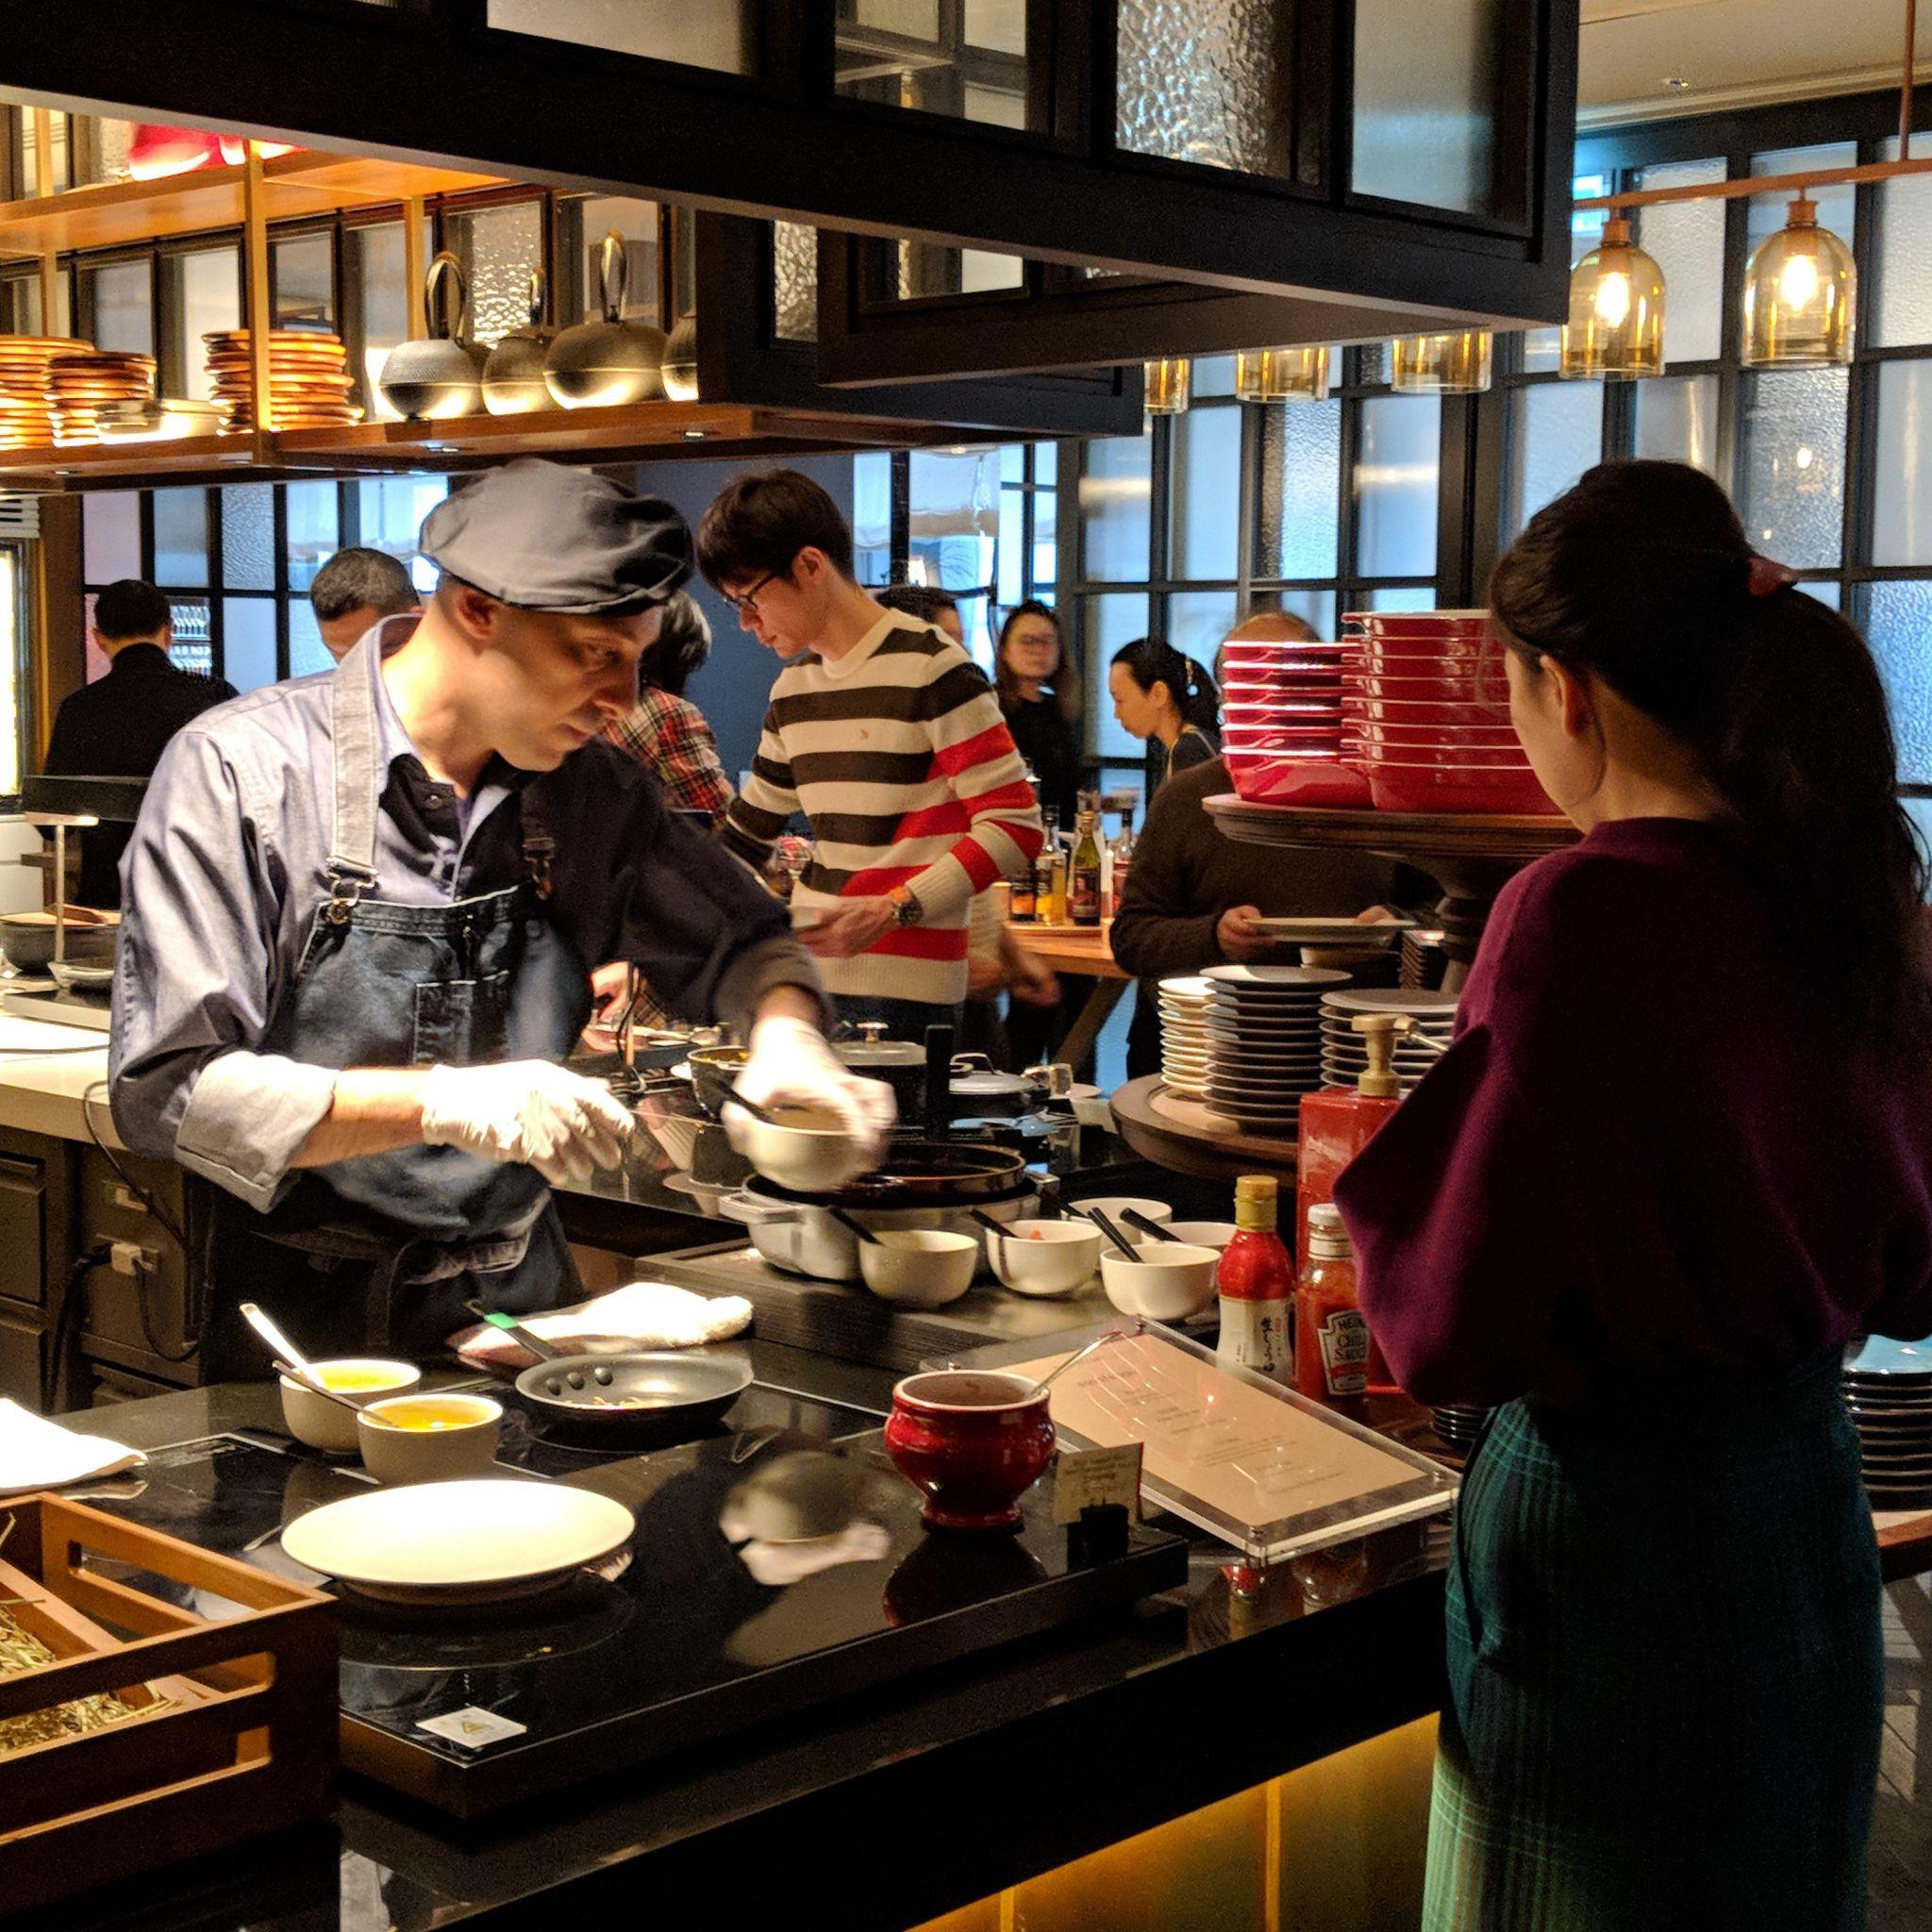 hyatt centric ginza tokyo NAMIKI667 breakfast egg station